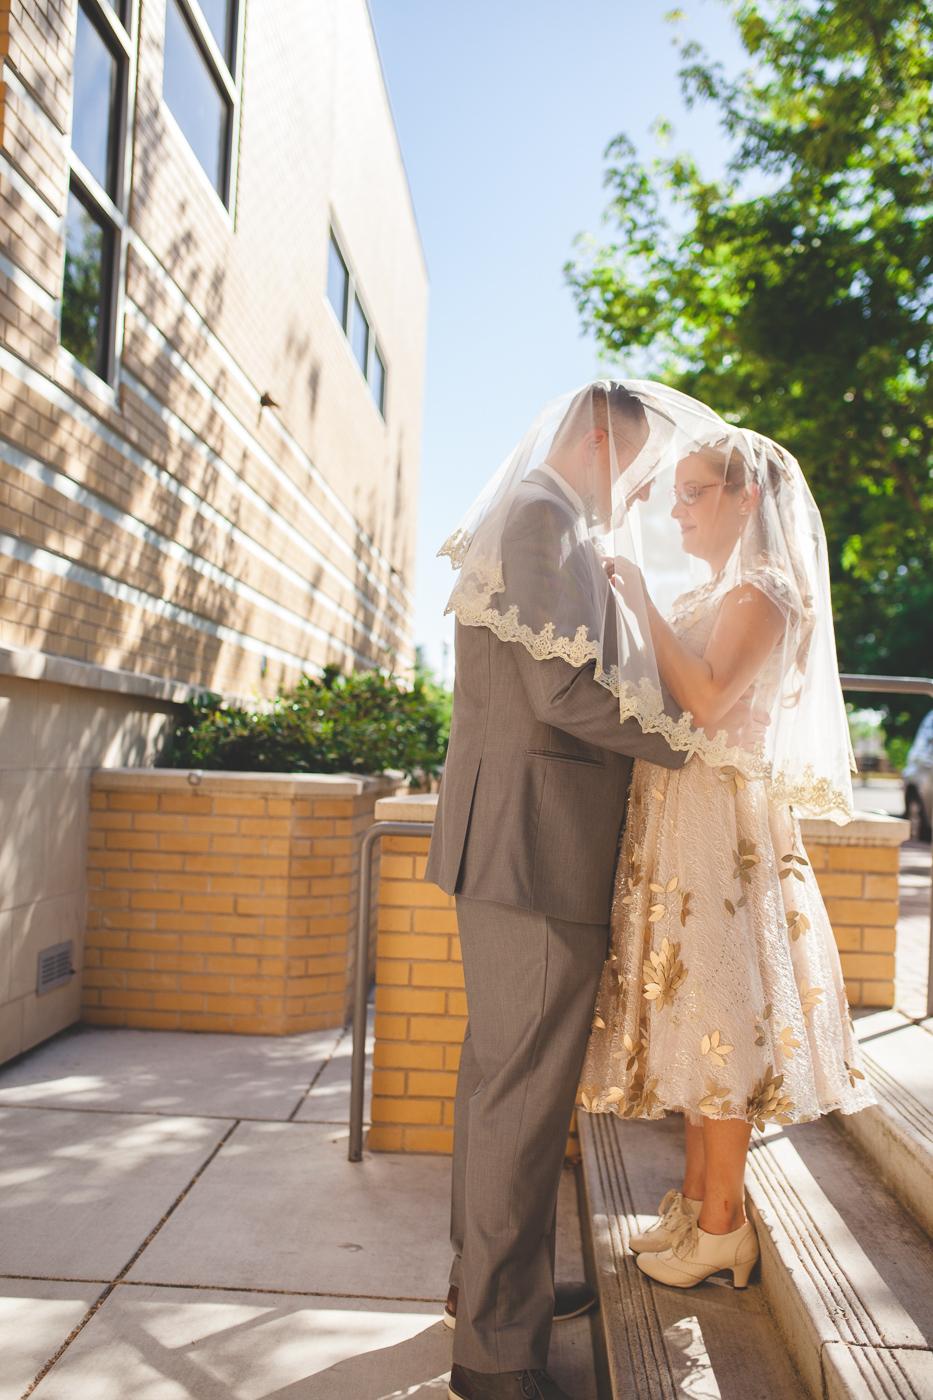 tol and smol wedding